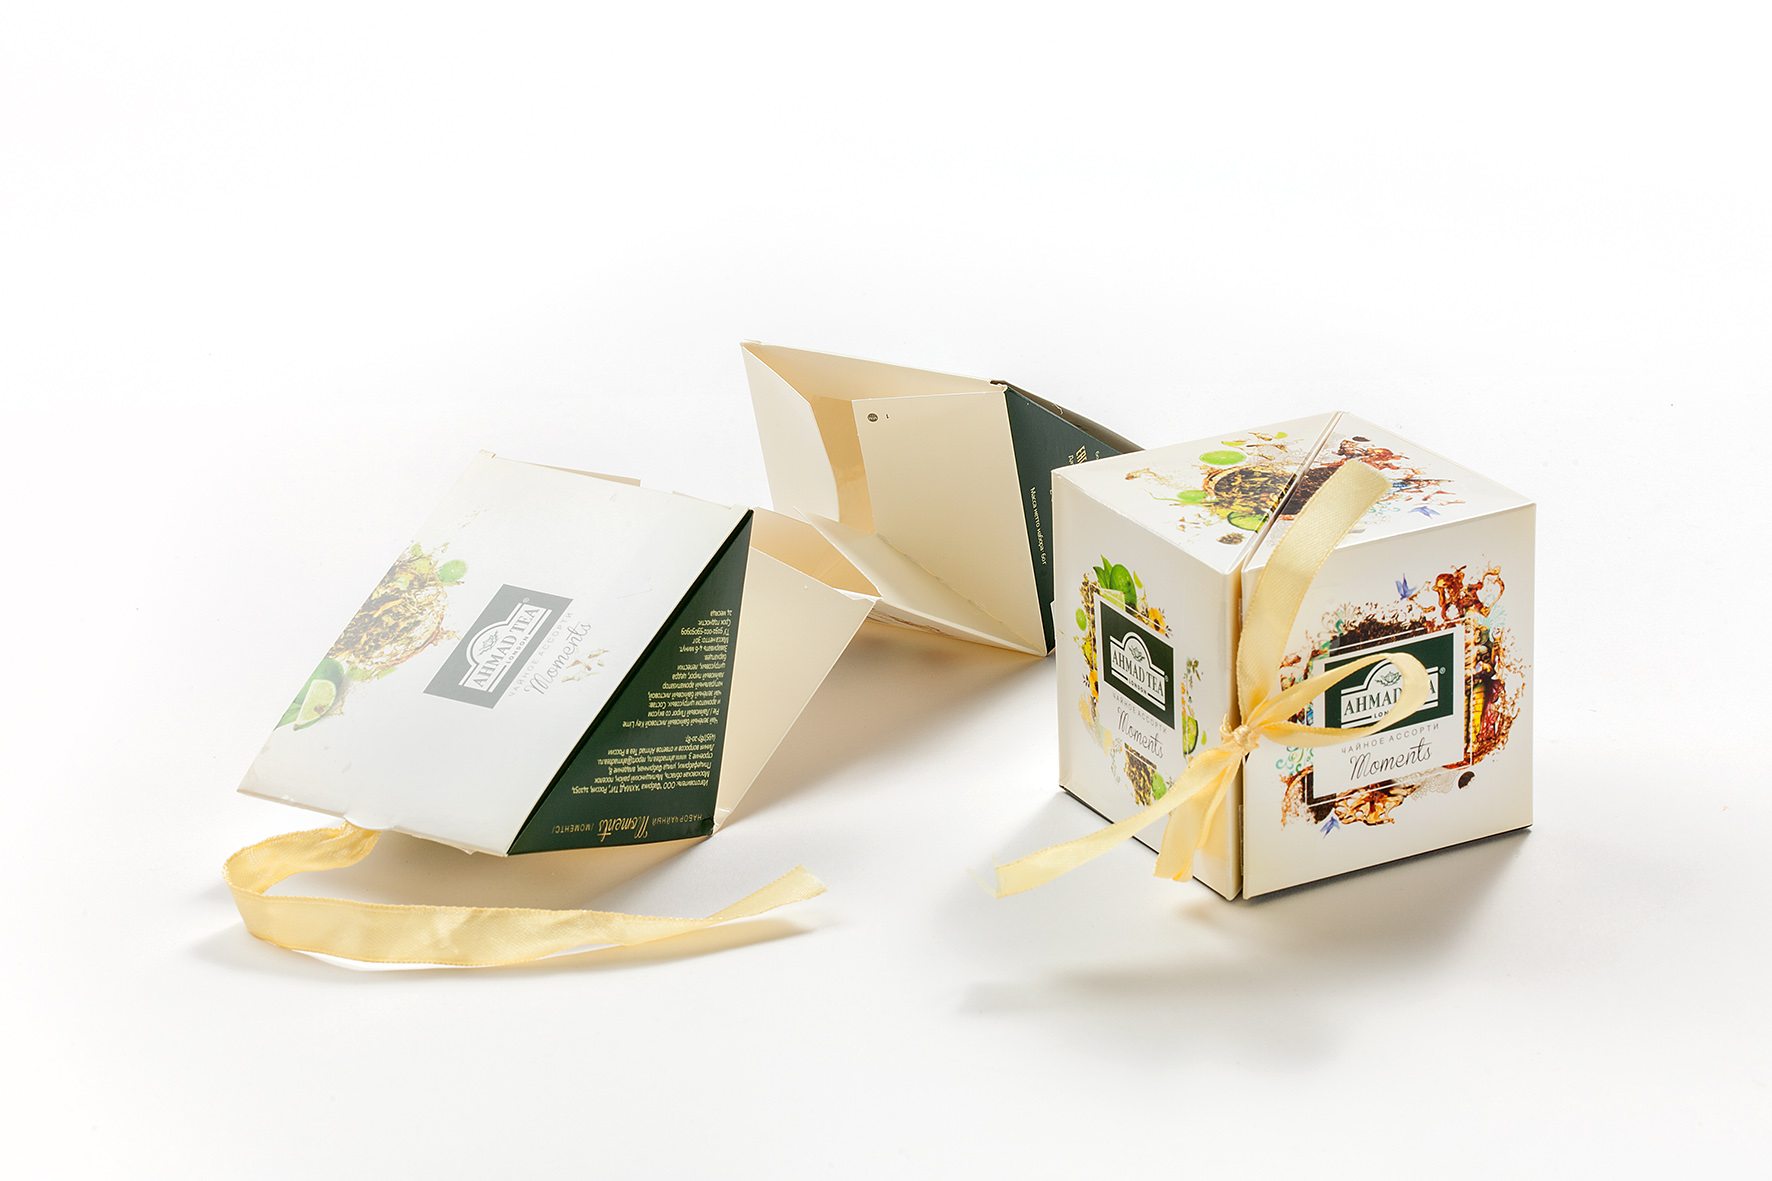 carton-award-image 140427